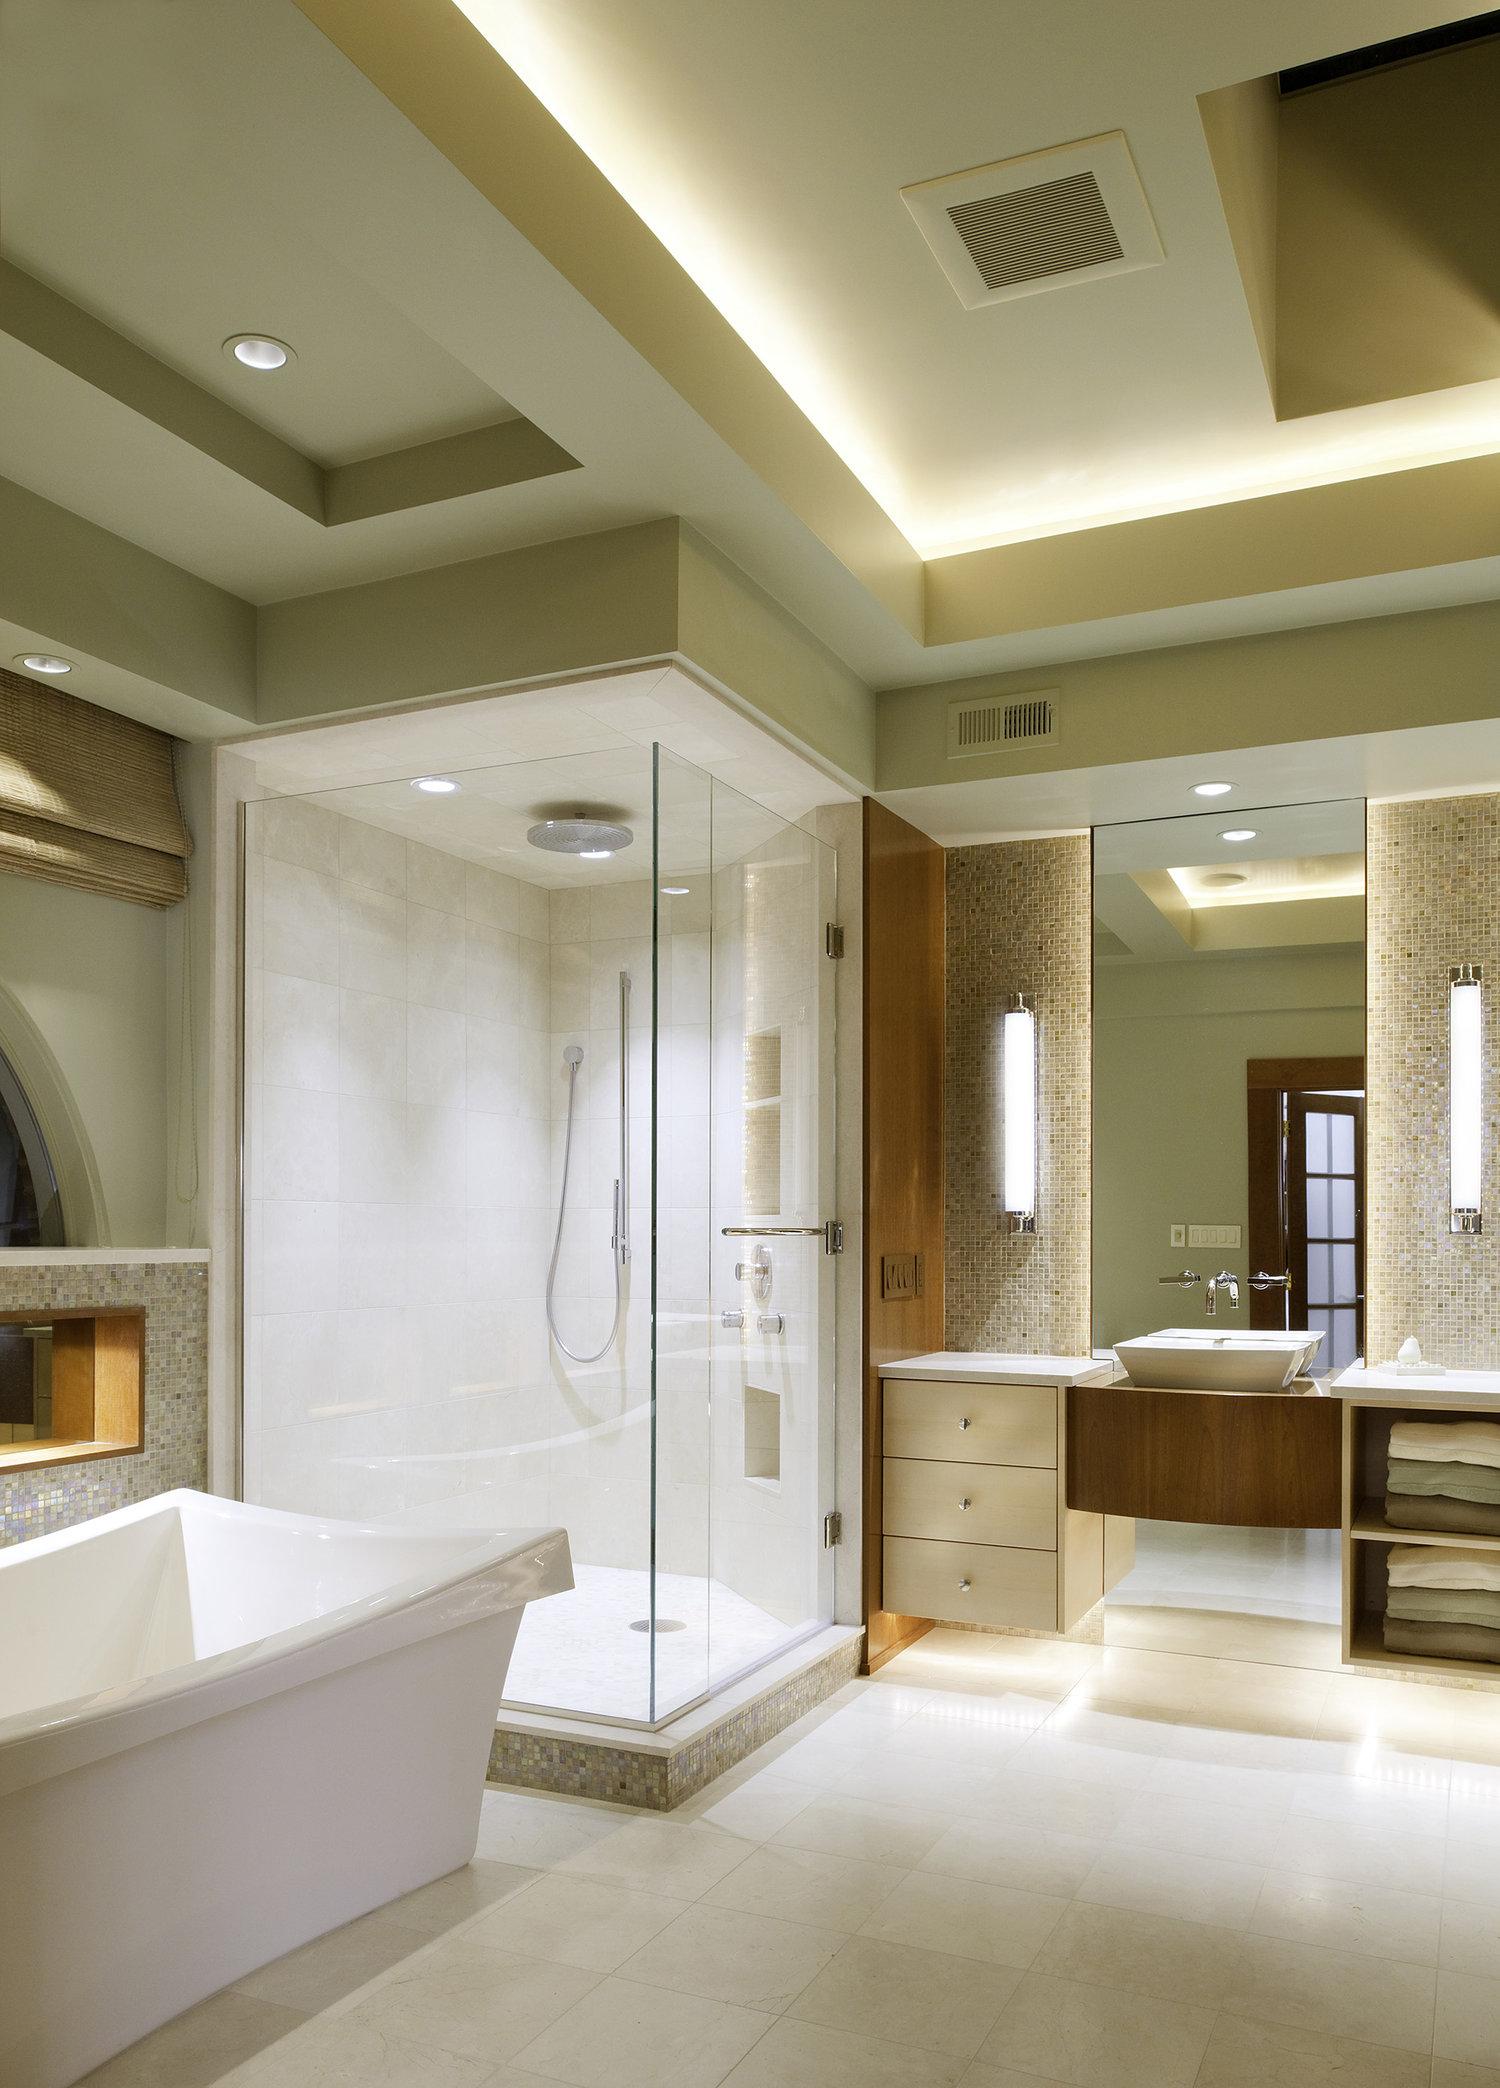 kitchen_bath_concepts_wholehome5_6.jpg